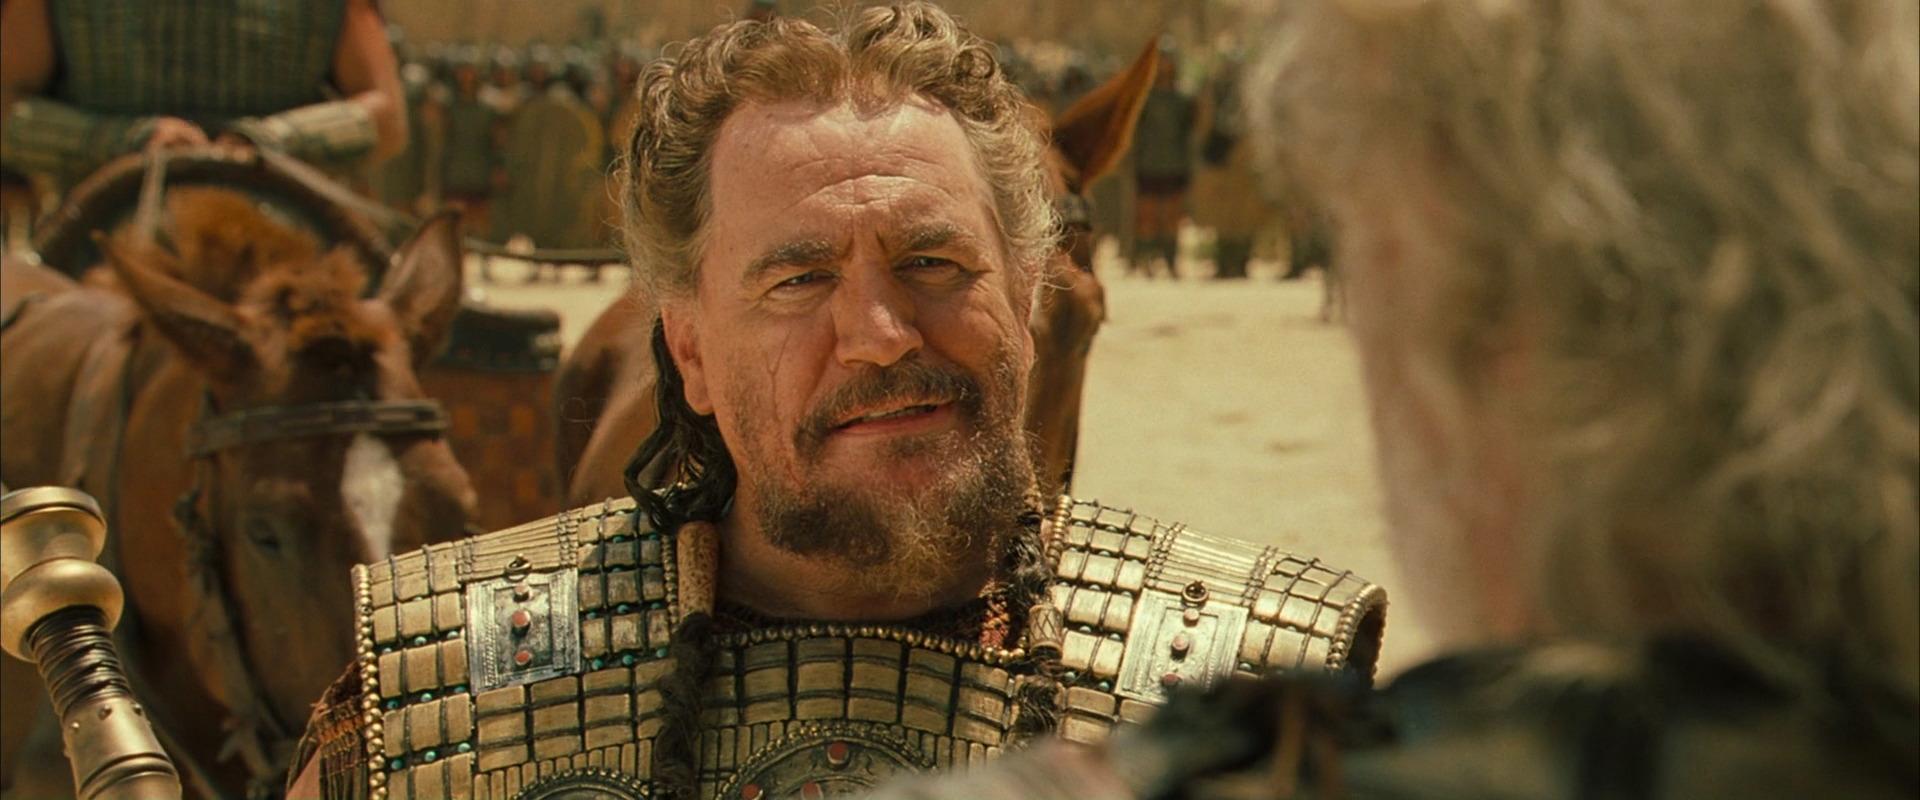 Agamemnon (Troy)